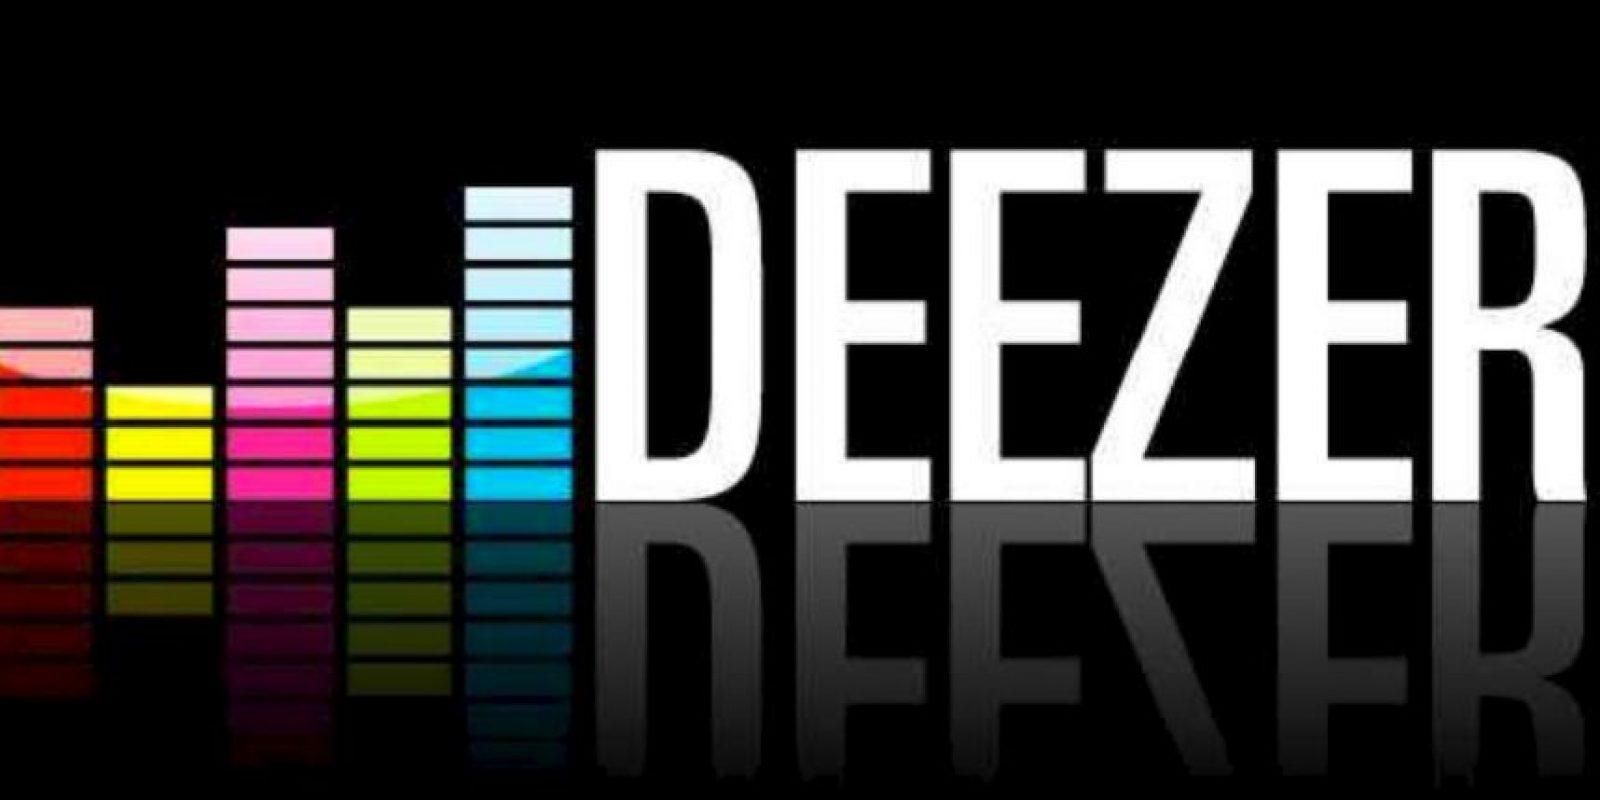 Deezer fue fundado en 2006 en Francia po Daniel Marhely y Jonathan Benassaya Foto:Deezer